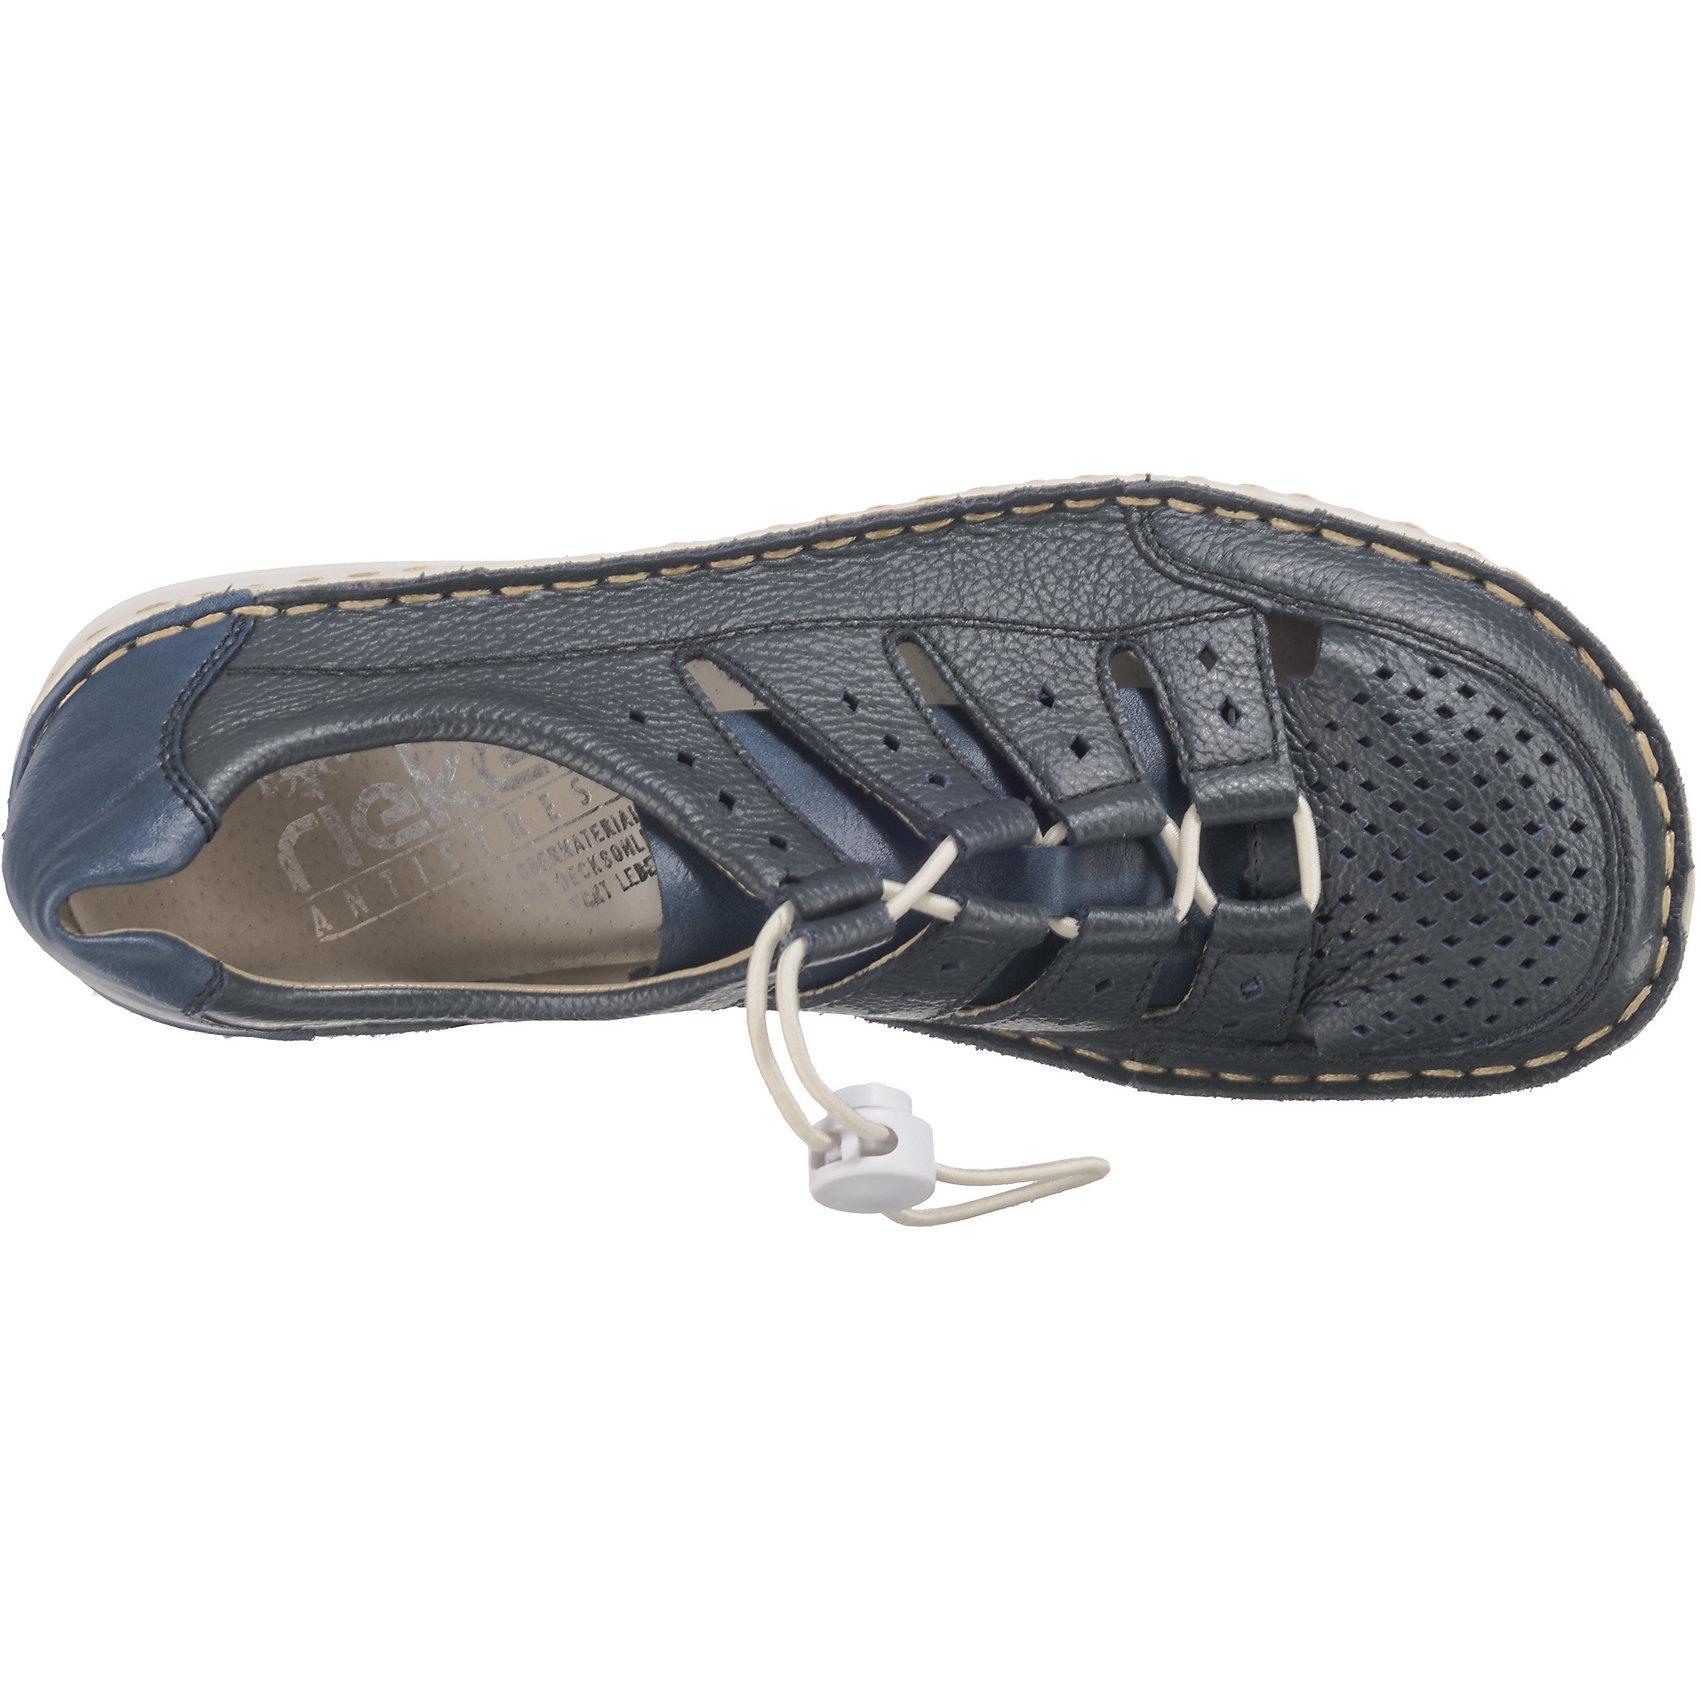 Rieker rieker Soho/Louisiana Sneakers Low, blau, blau